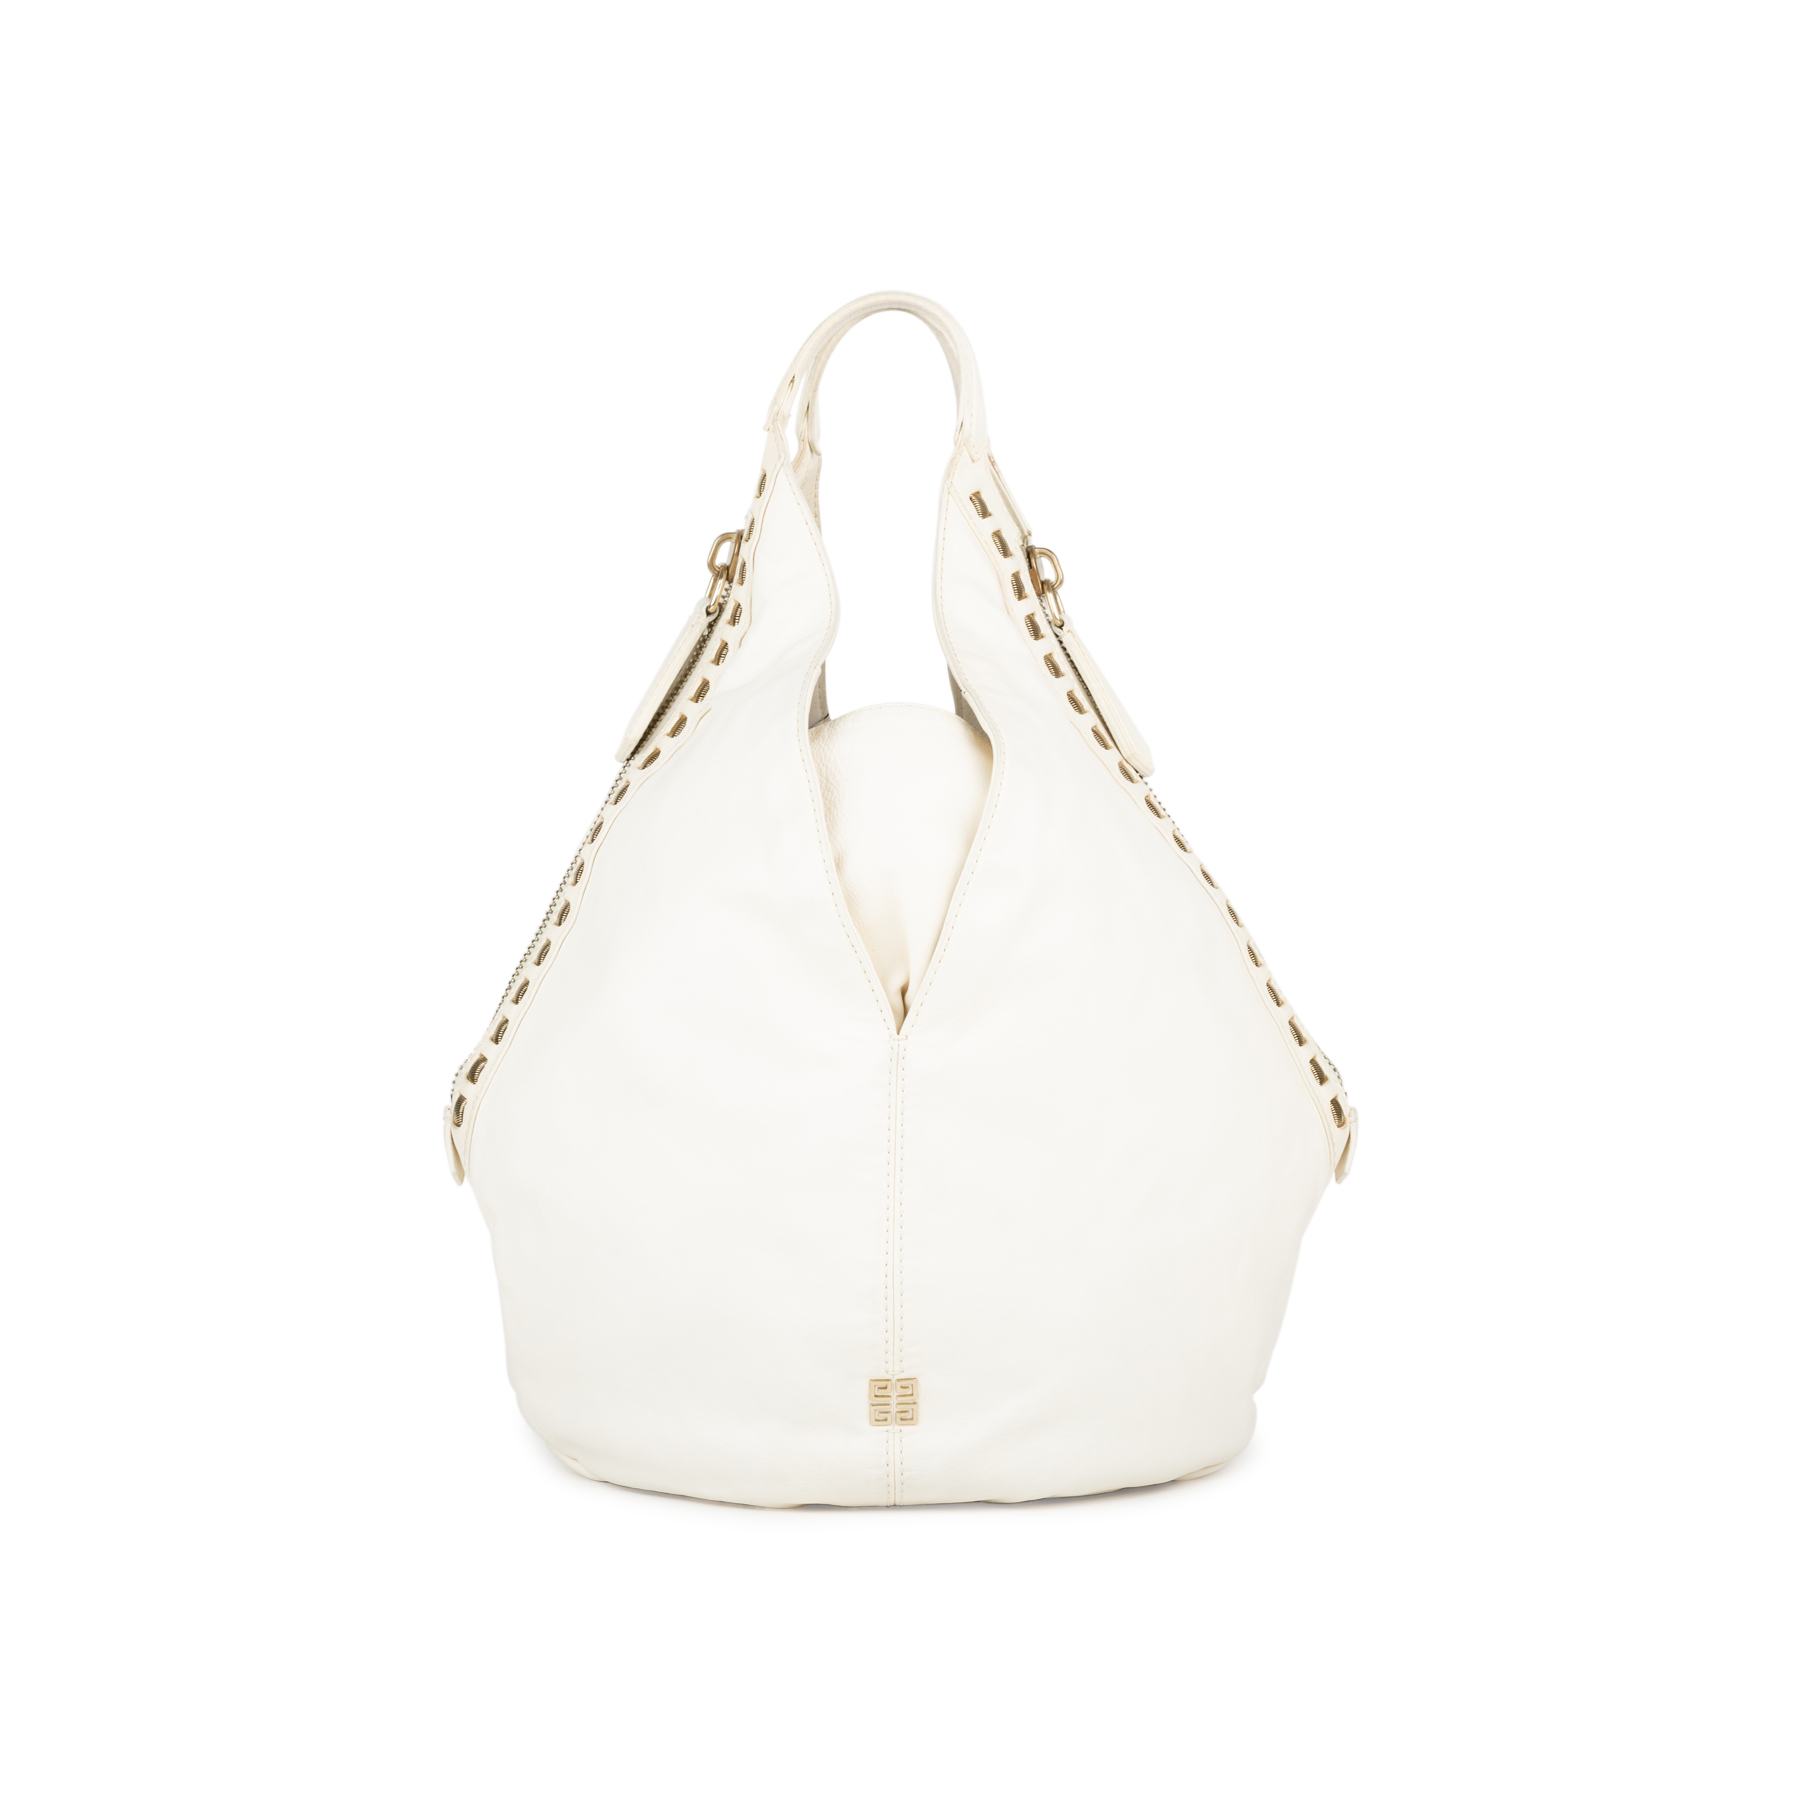 ca9bfa9868 Authentic Second Hand Givenchy Tinhan Bag (PSS-356-00026)